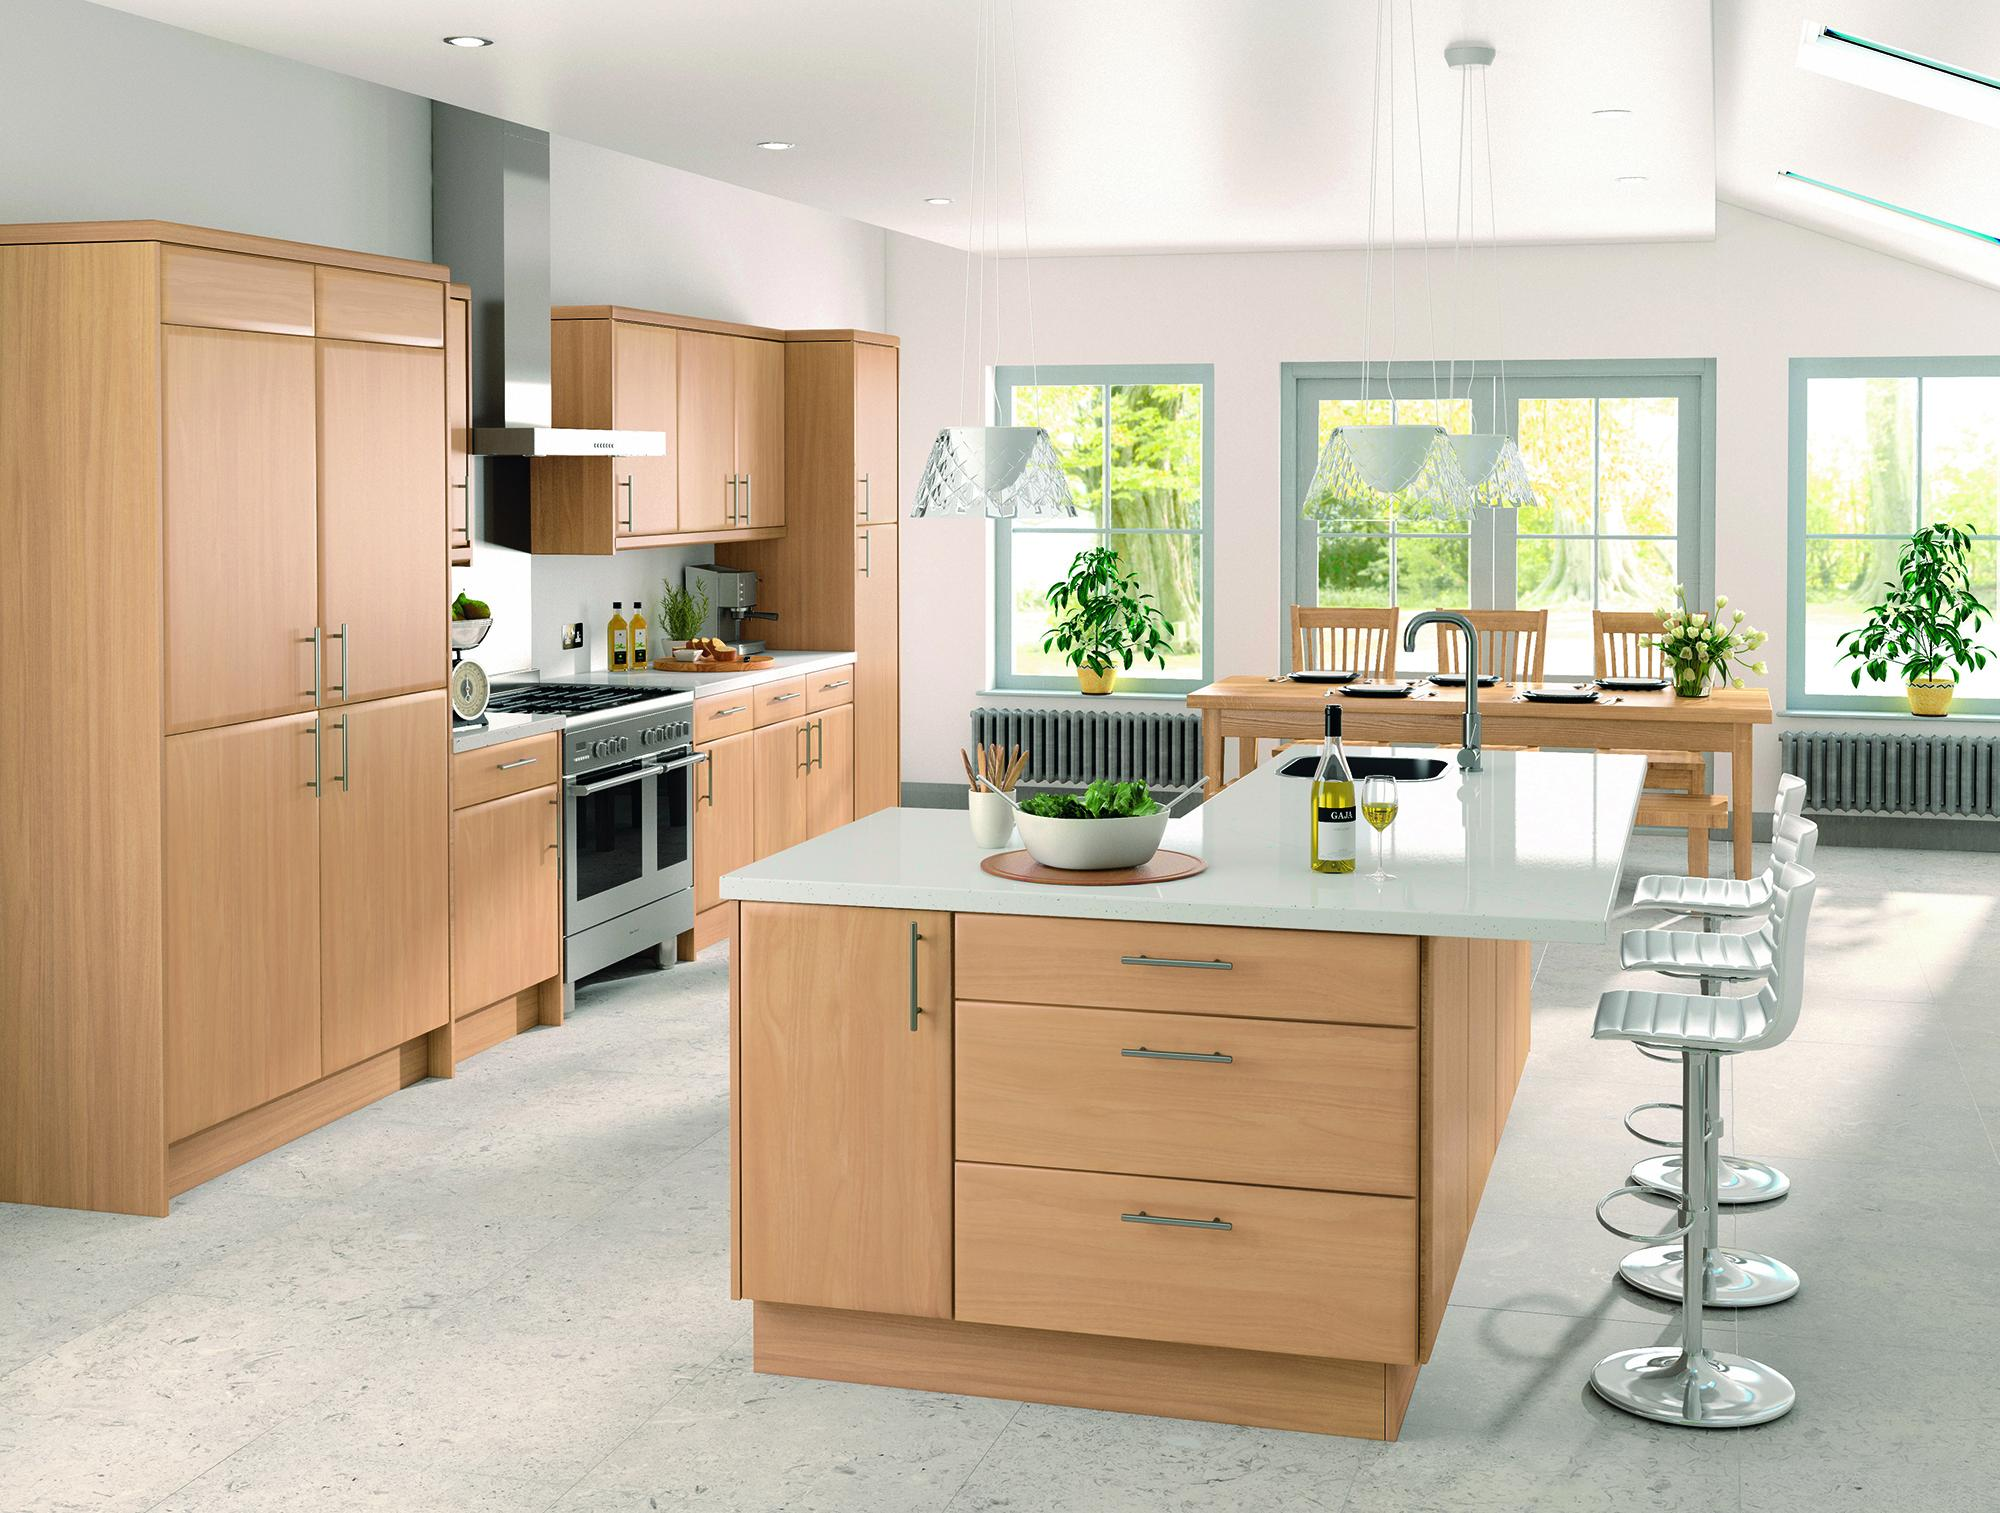 Светло-розовые обои на кухне